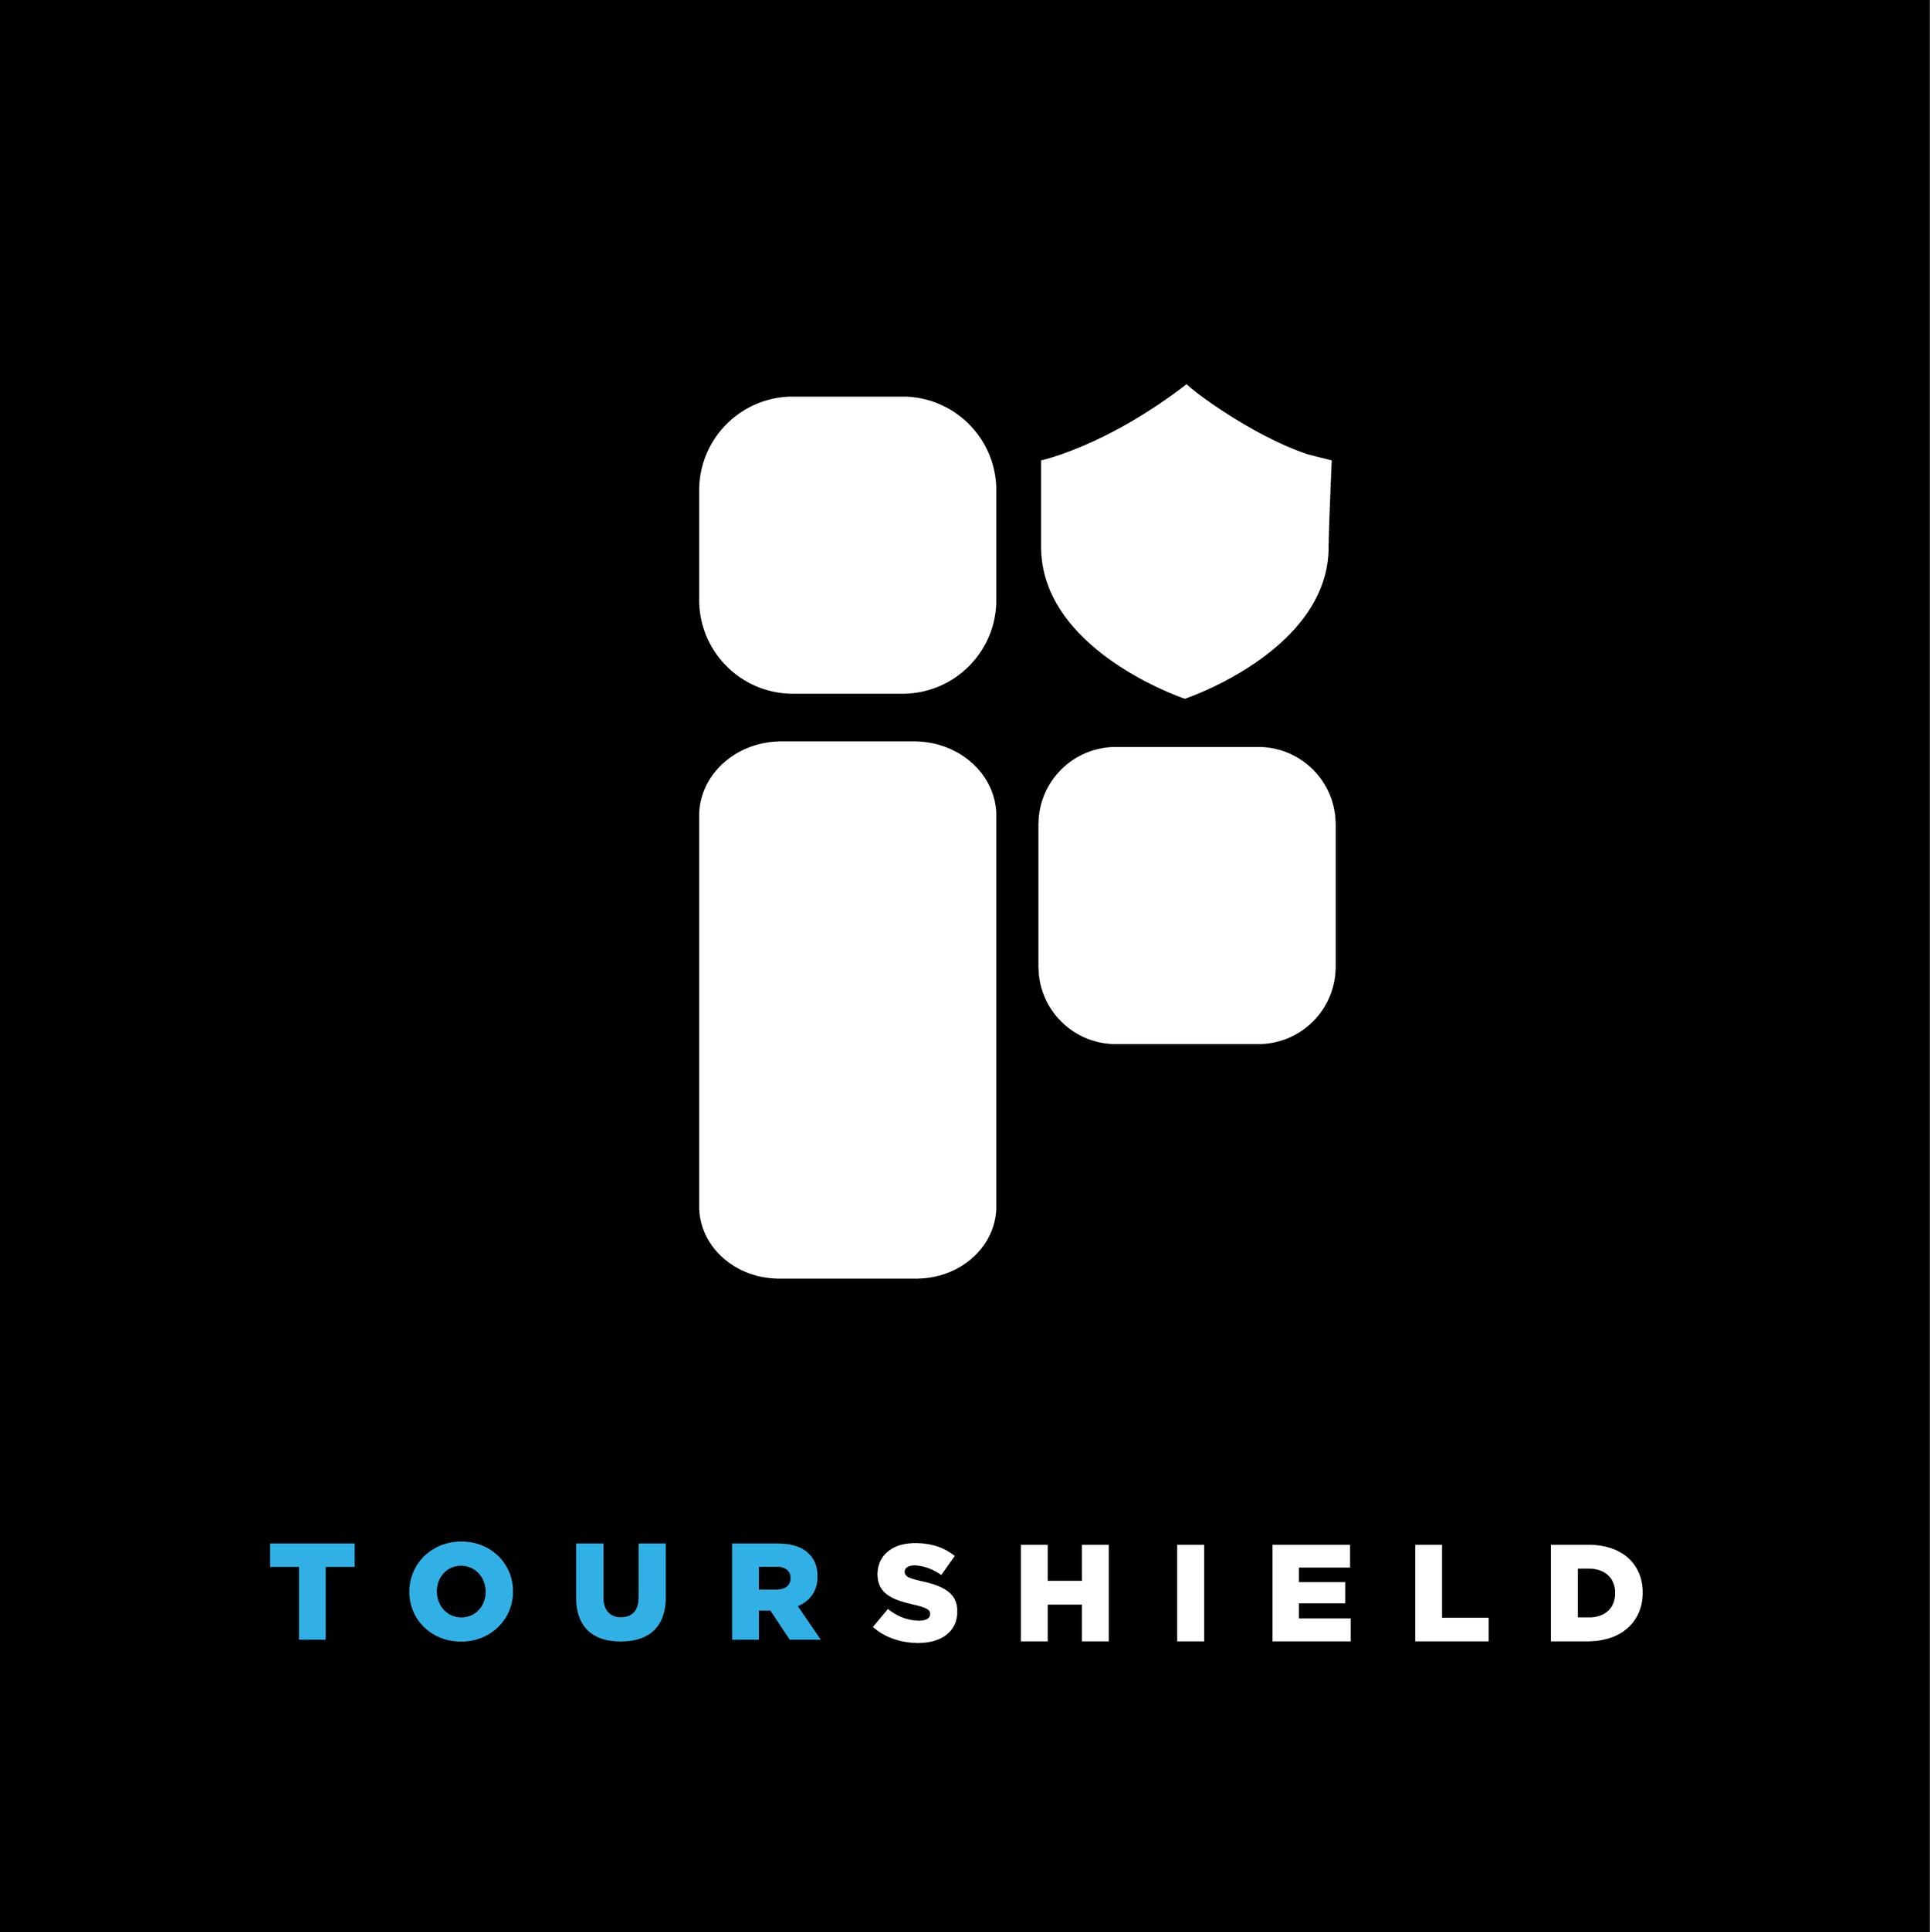 TourShield_Square_Blk (2).png